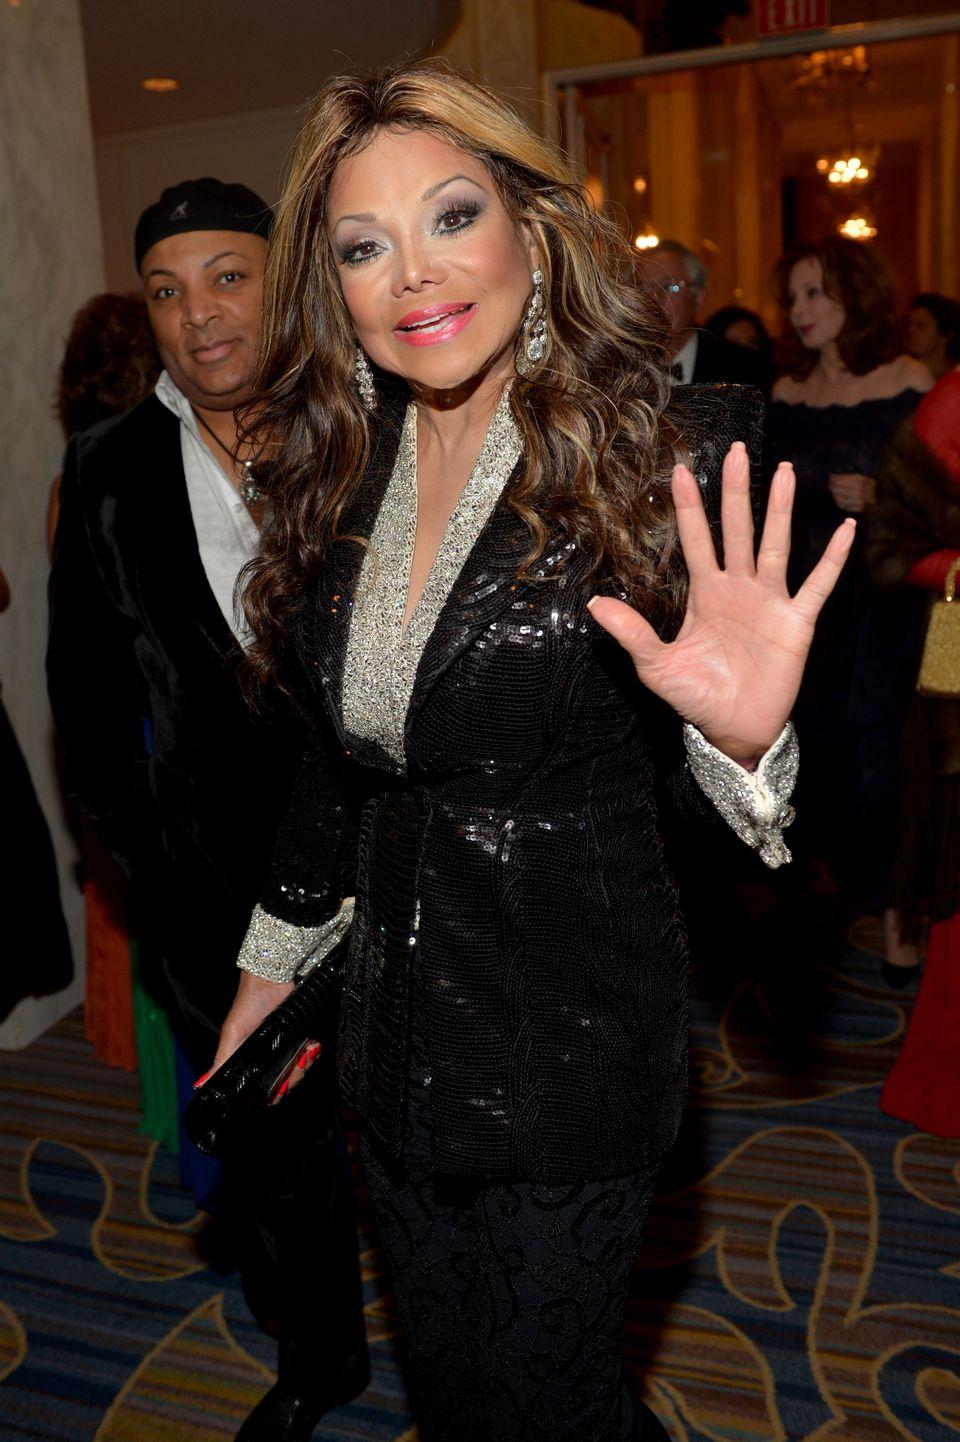 "BEVERLY HILLS, CA - JANUARY 14:  <a href=""http://www.oprah.com/app/life-with-latoya.html"" target=""_blank"">La Toya Jackson</a>"